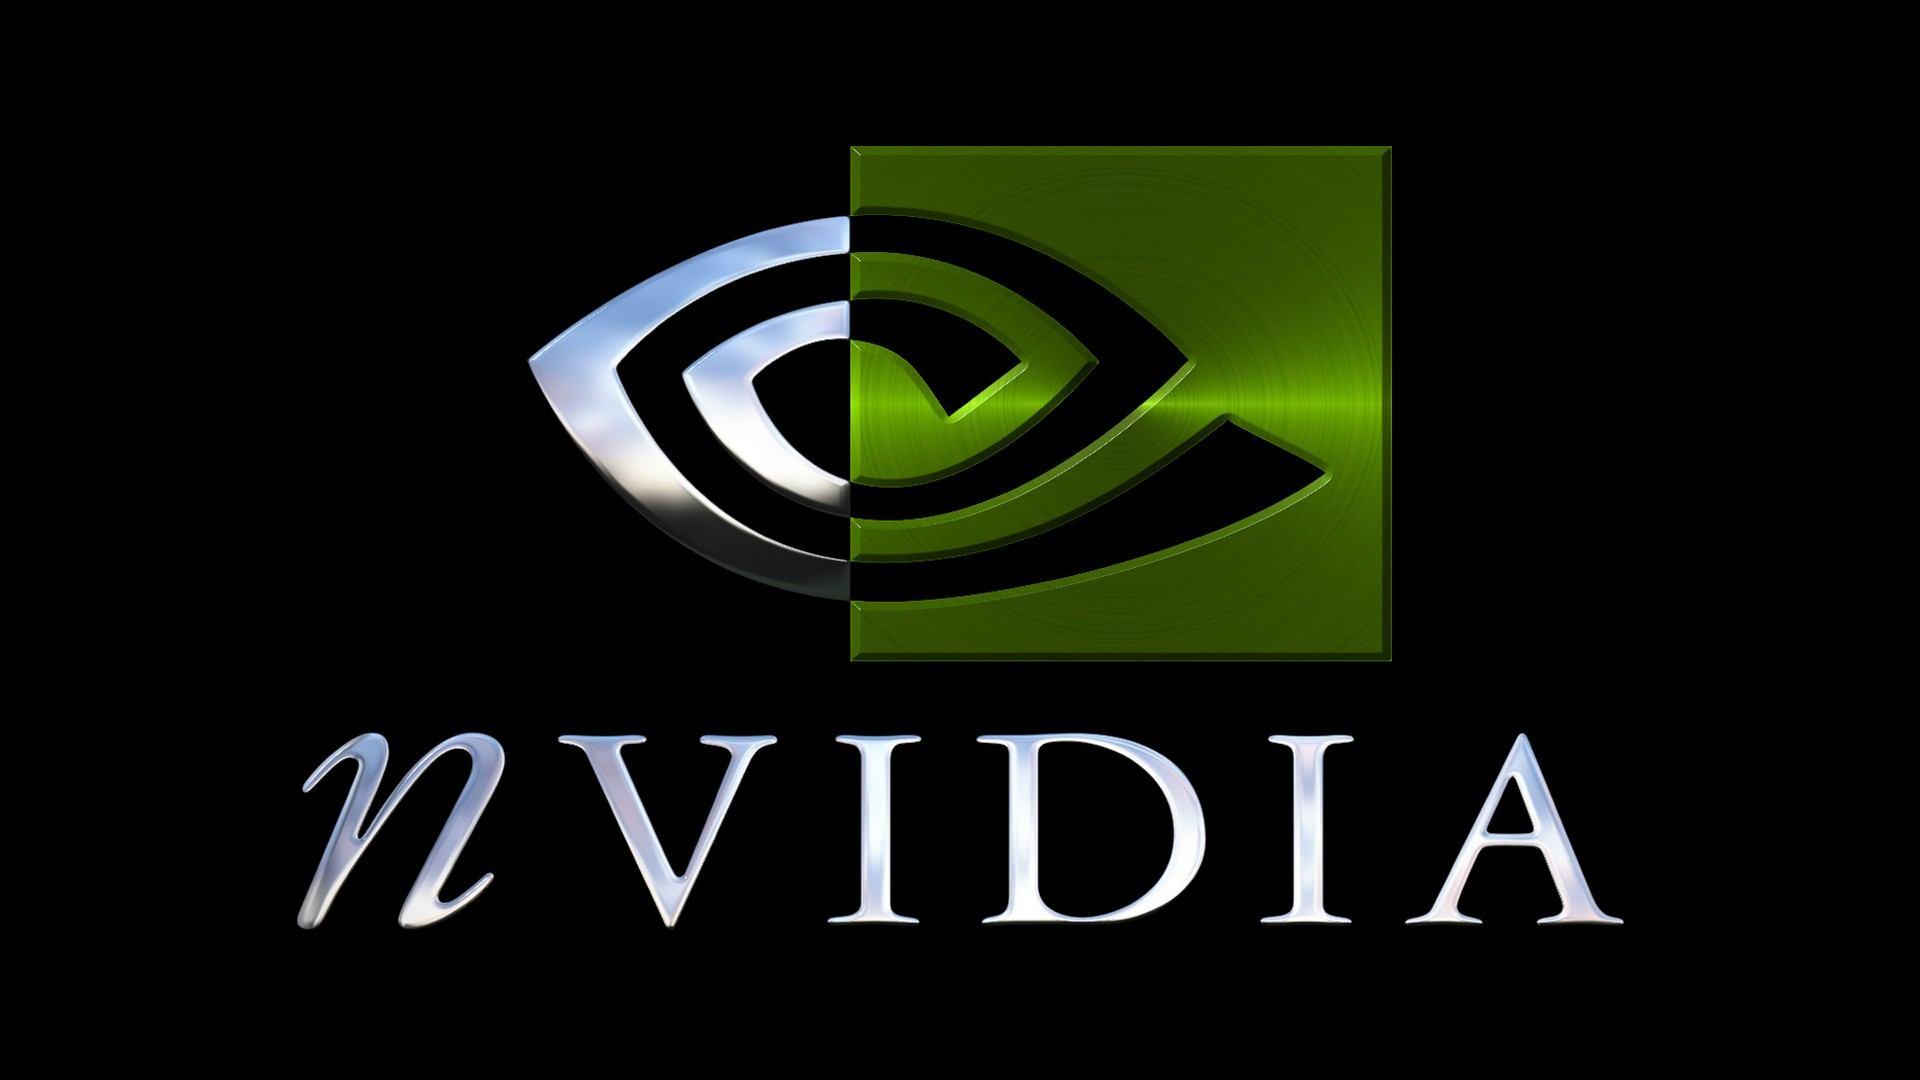 NVIDIA Driver Forceware 344 مشغل التعريف الشامل والأحدث